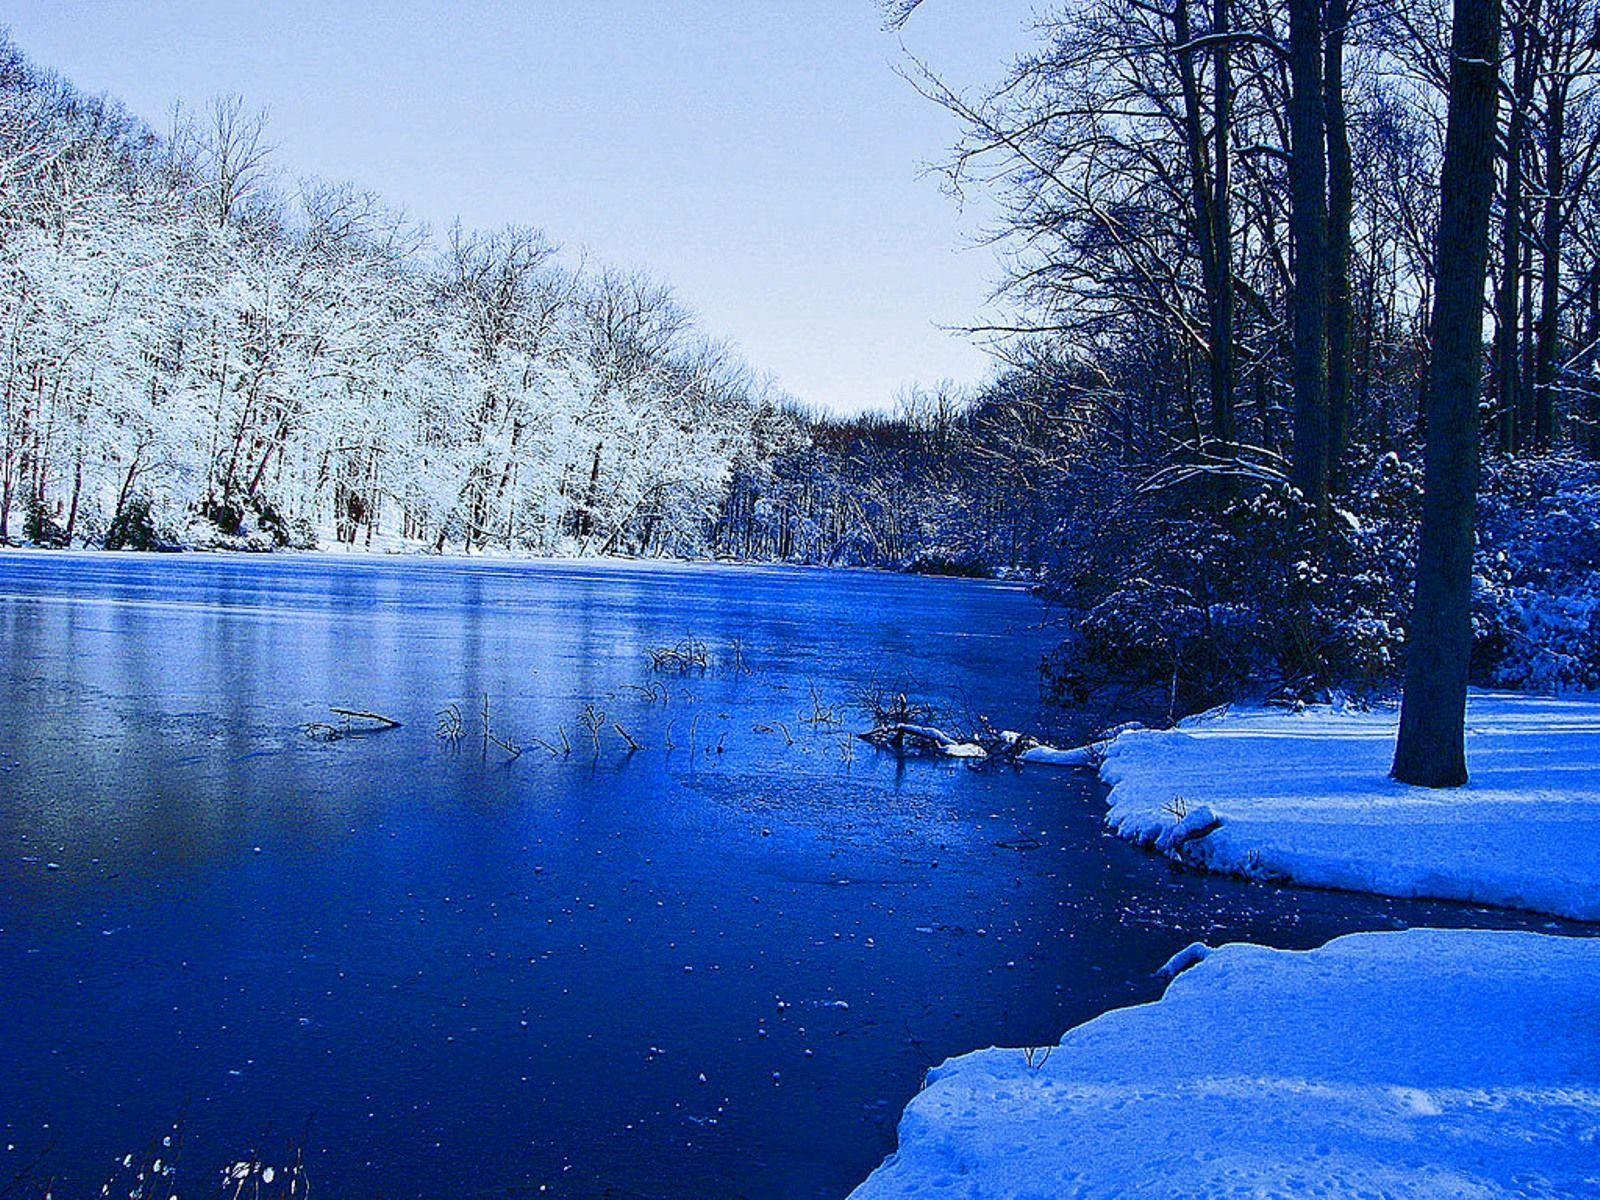 scenic winter beautiful wallpapers - photo #30